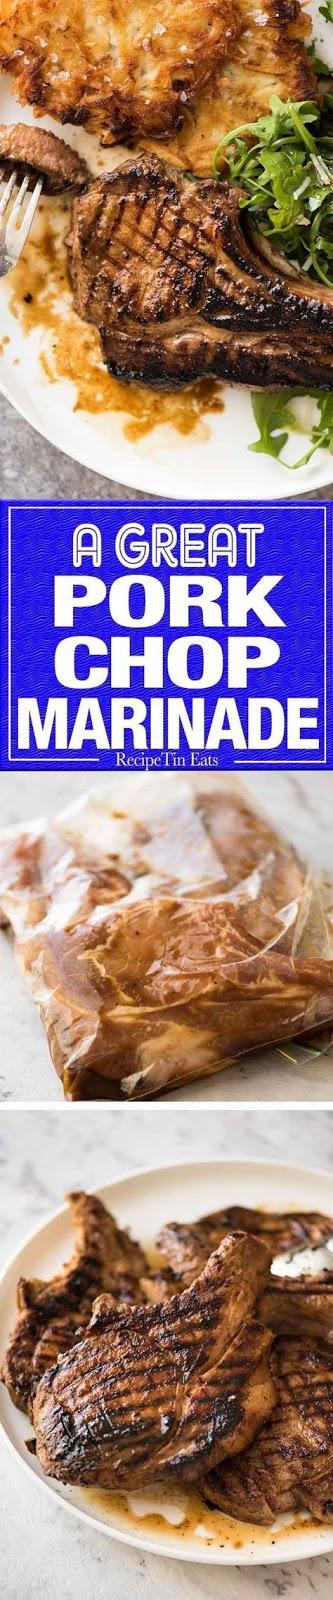 A #Great #Pork #Chop #Marinade